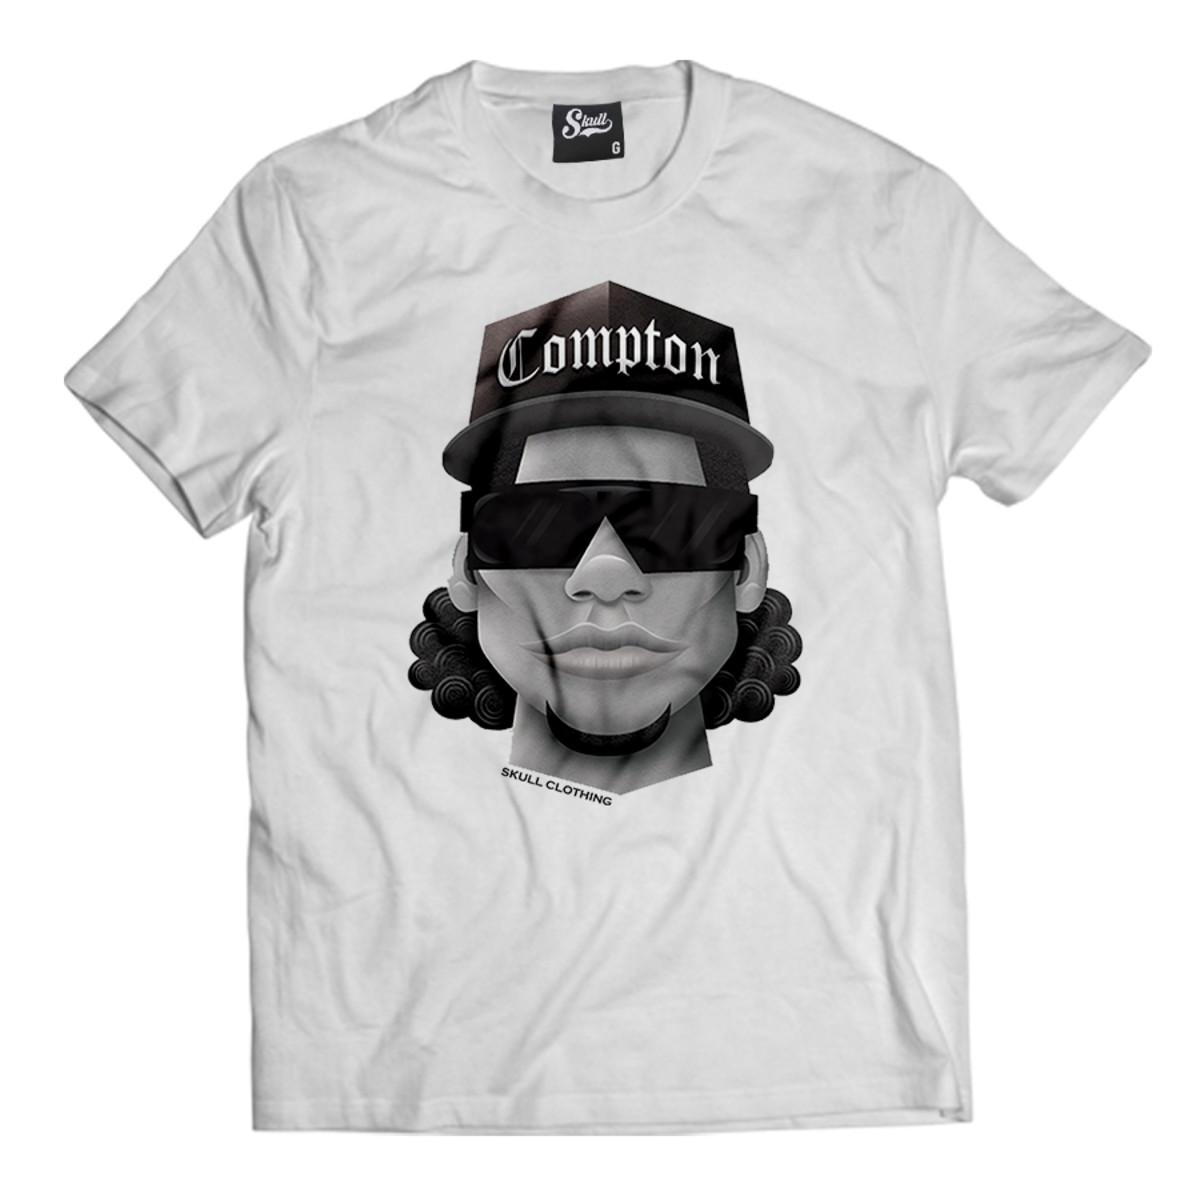 924dbfbd1597b Camiseta Compton Eazy-E Rapper Camisa Masculina Rap Hip-hop no Elo7 ...